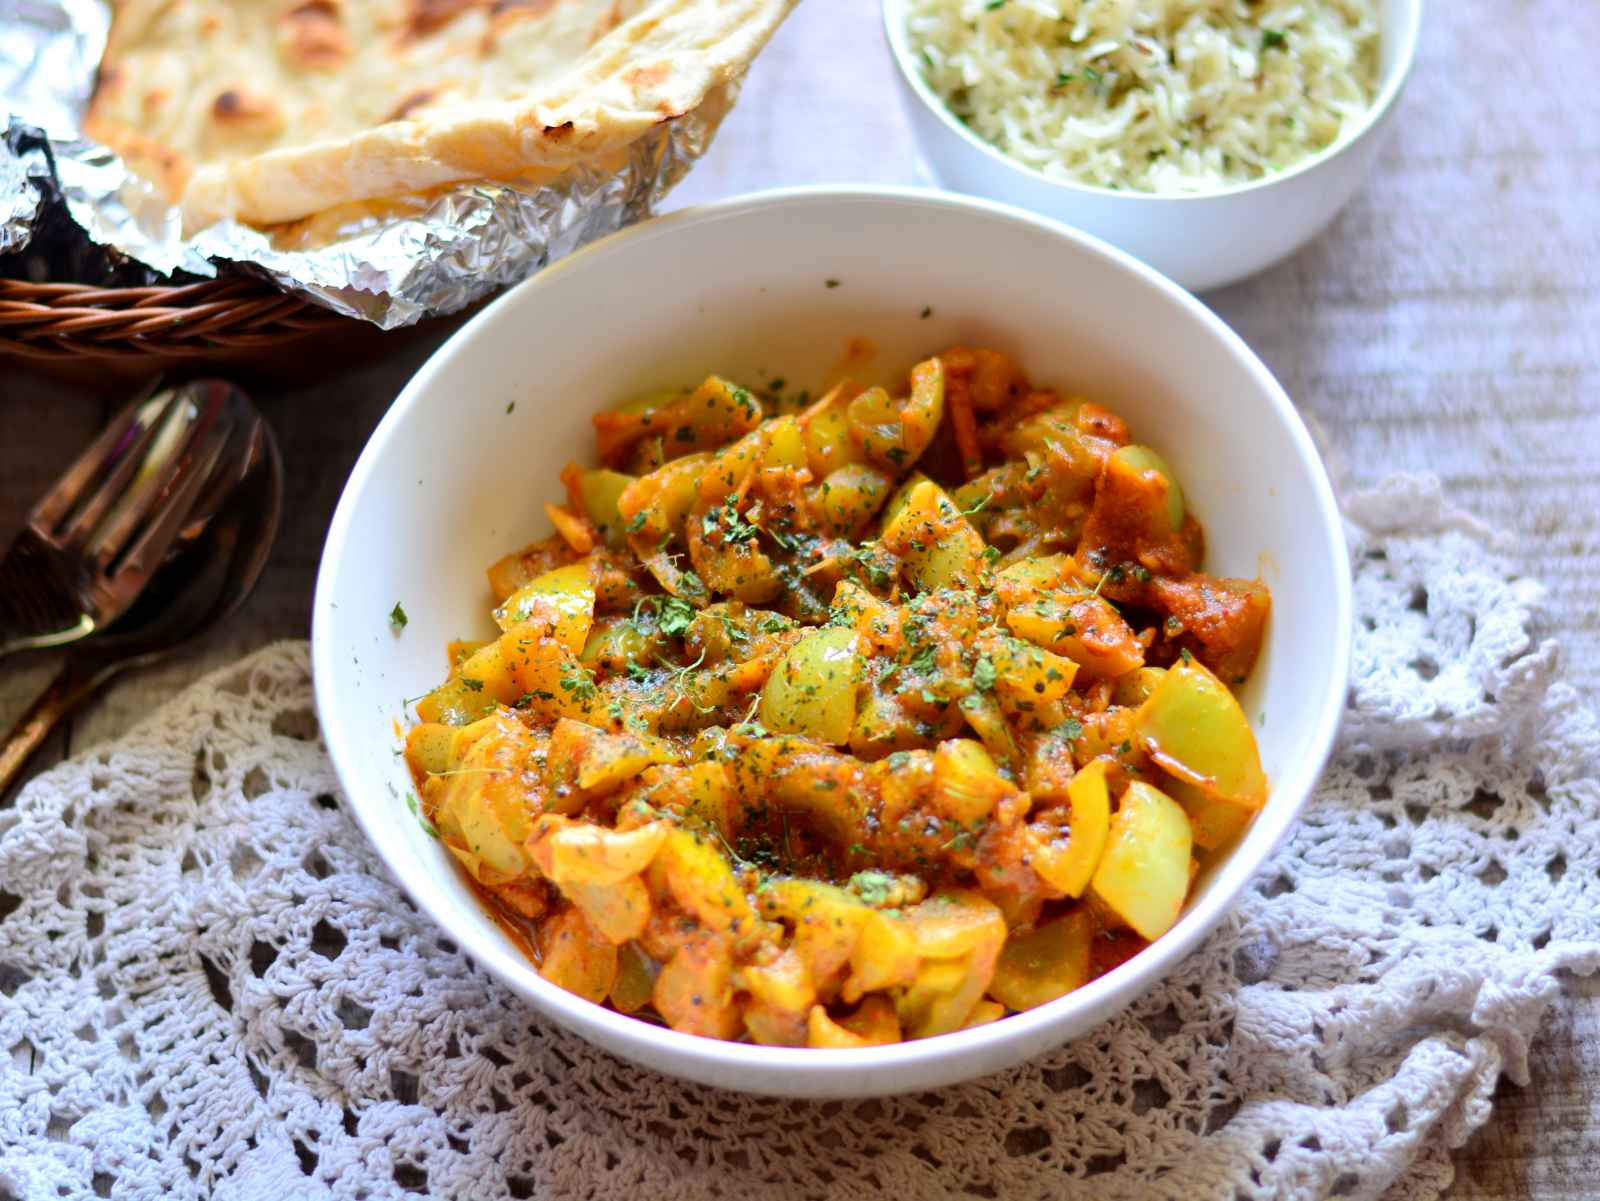 Hare tamatar ki sabzi recipe by archanas kitchen hare tamatar ki sabzi recipe raw tomato curry forumfinder Images